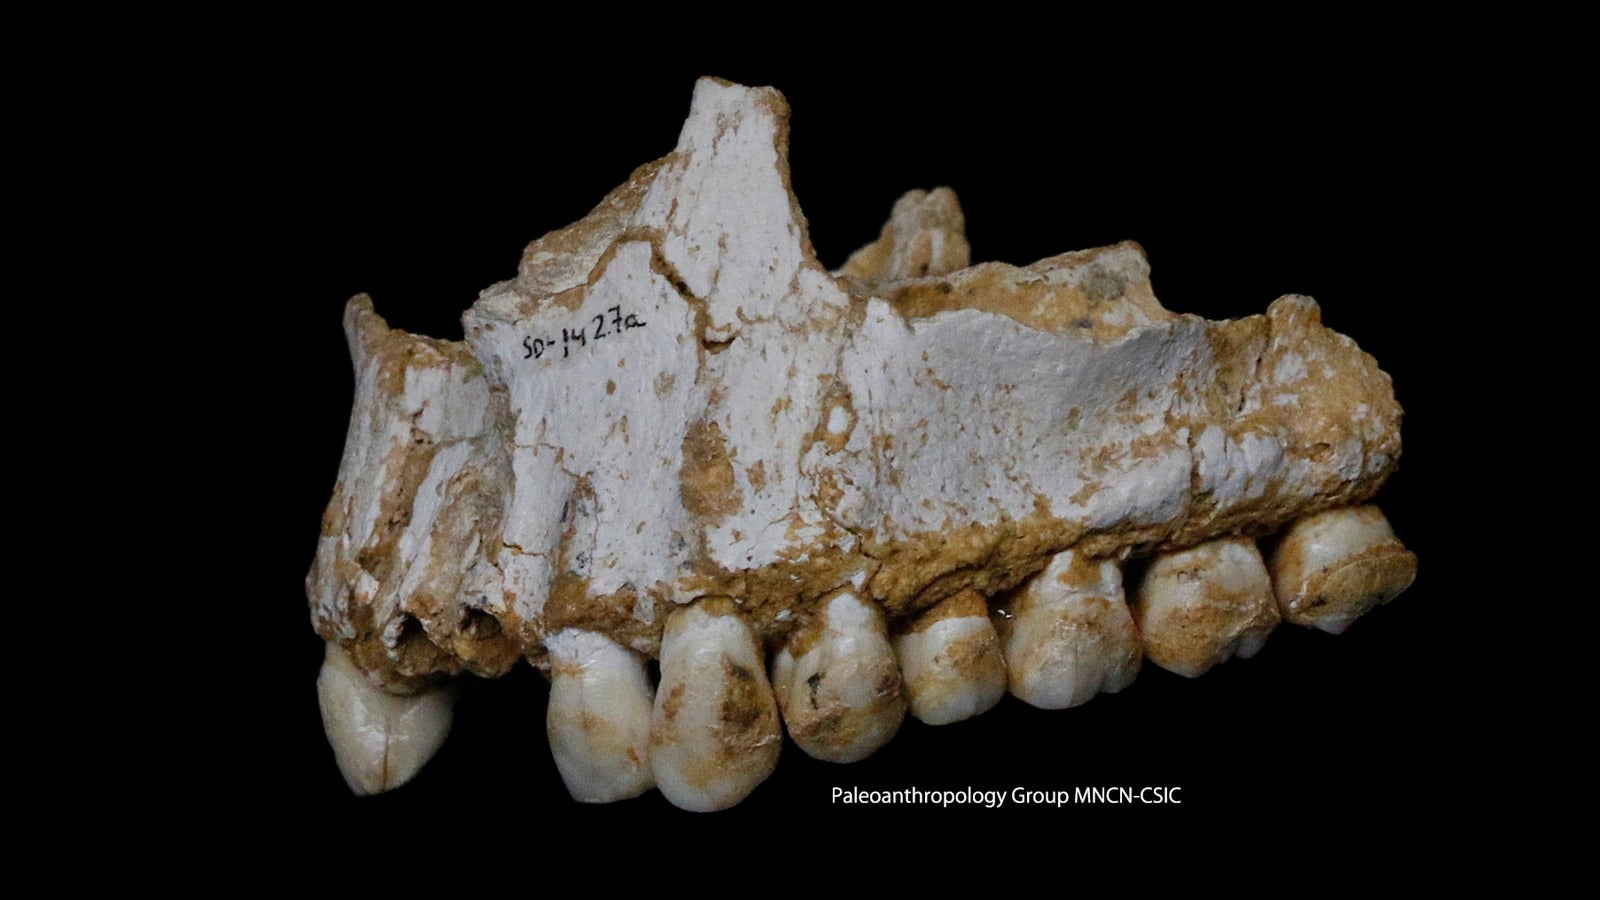 Ancient Tooth Plaque Divulges Neanderthal's Surprisingly Diverse Diets